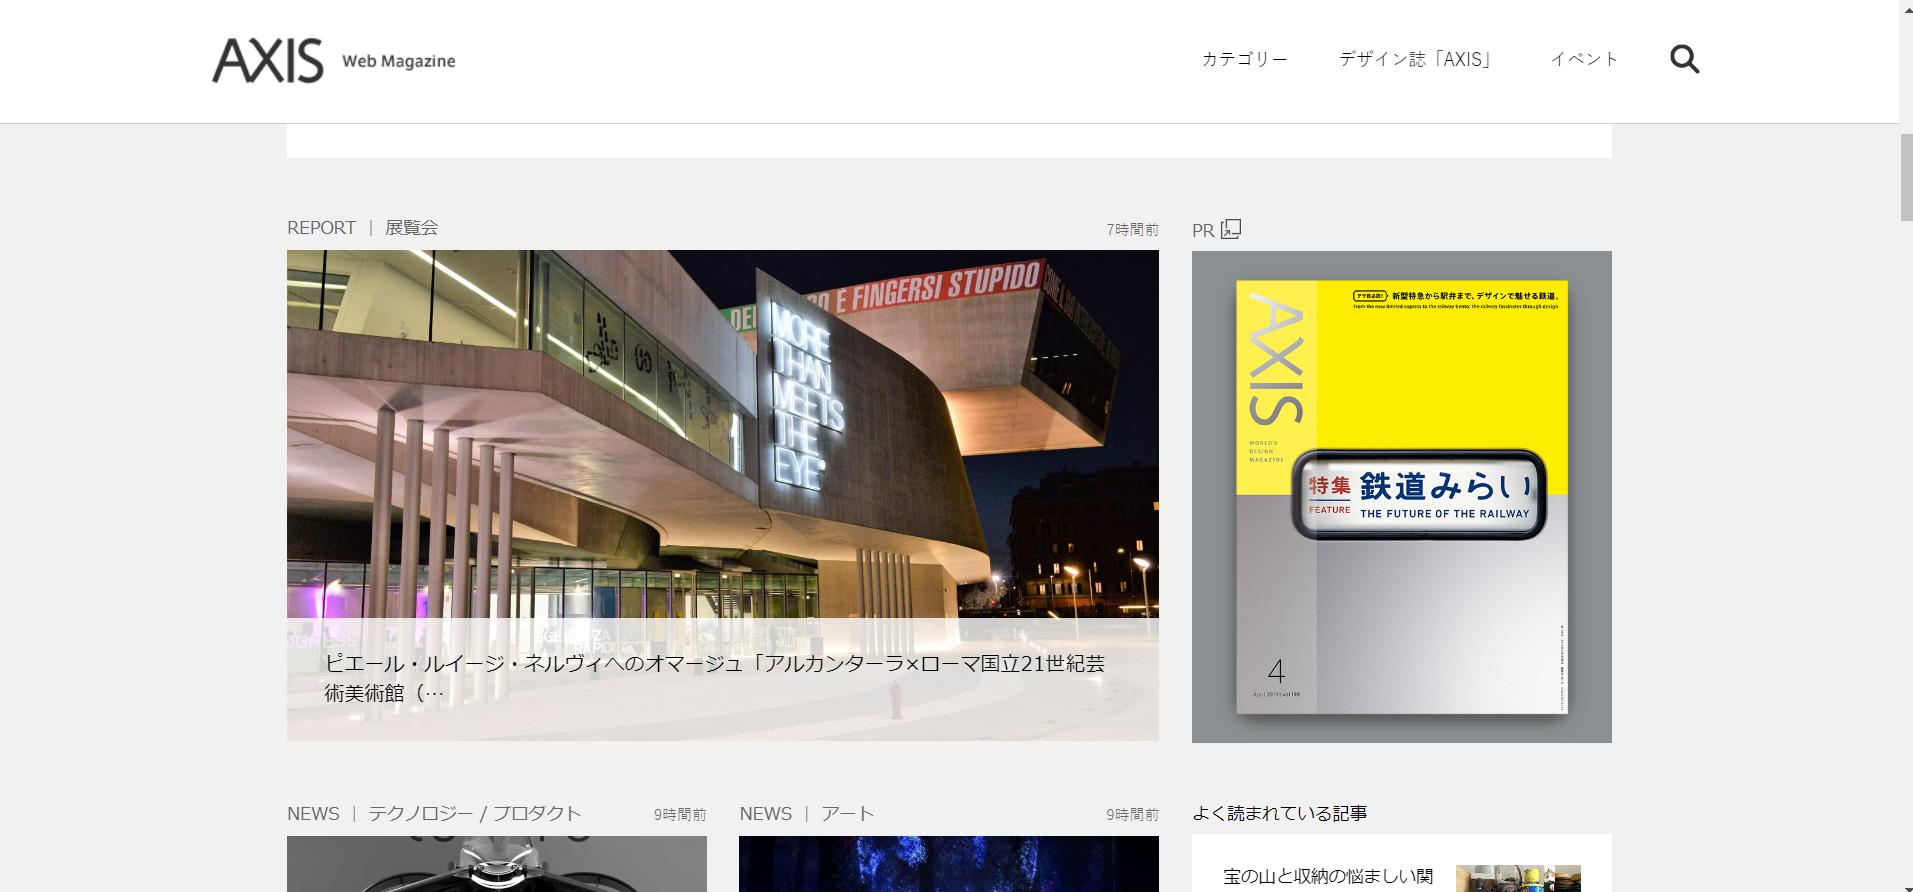 web_Magazin_AXIS